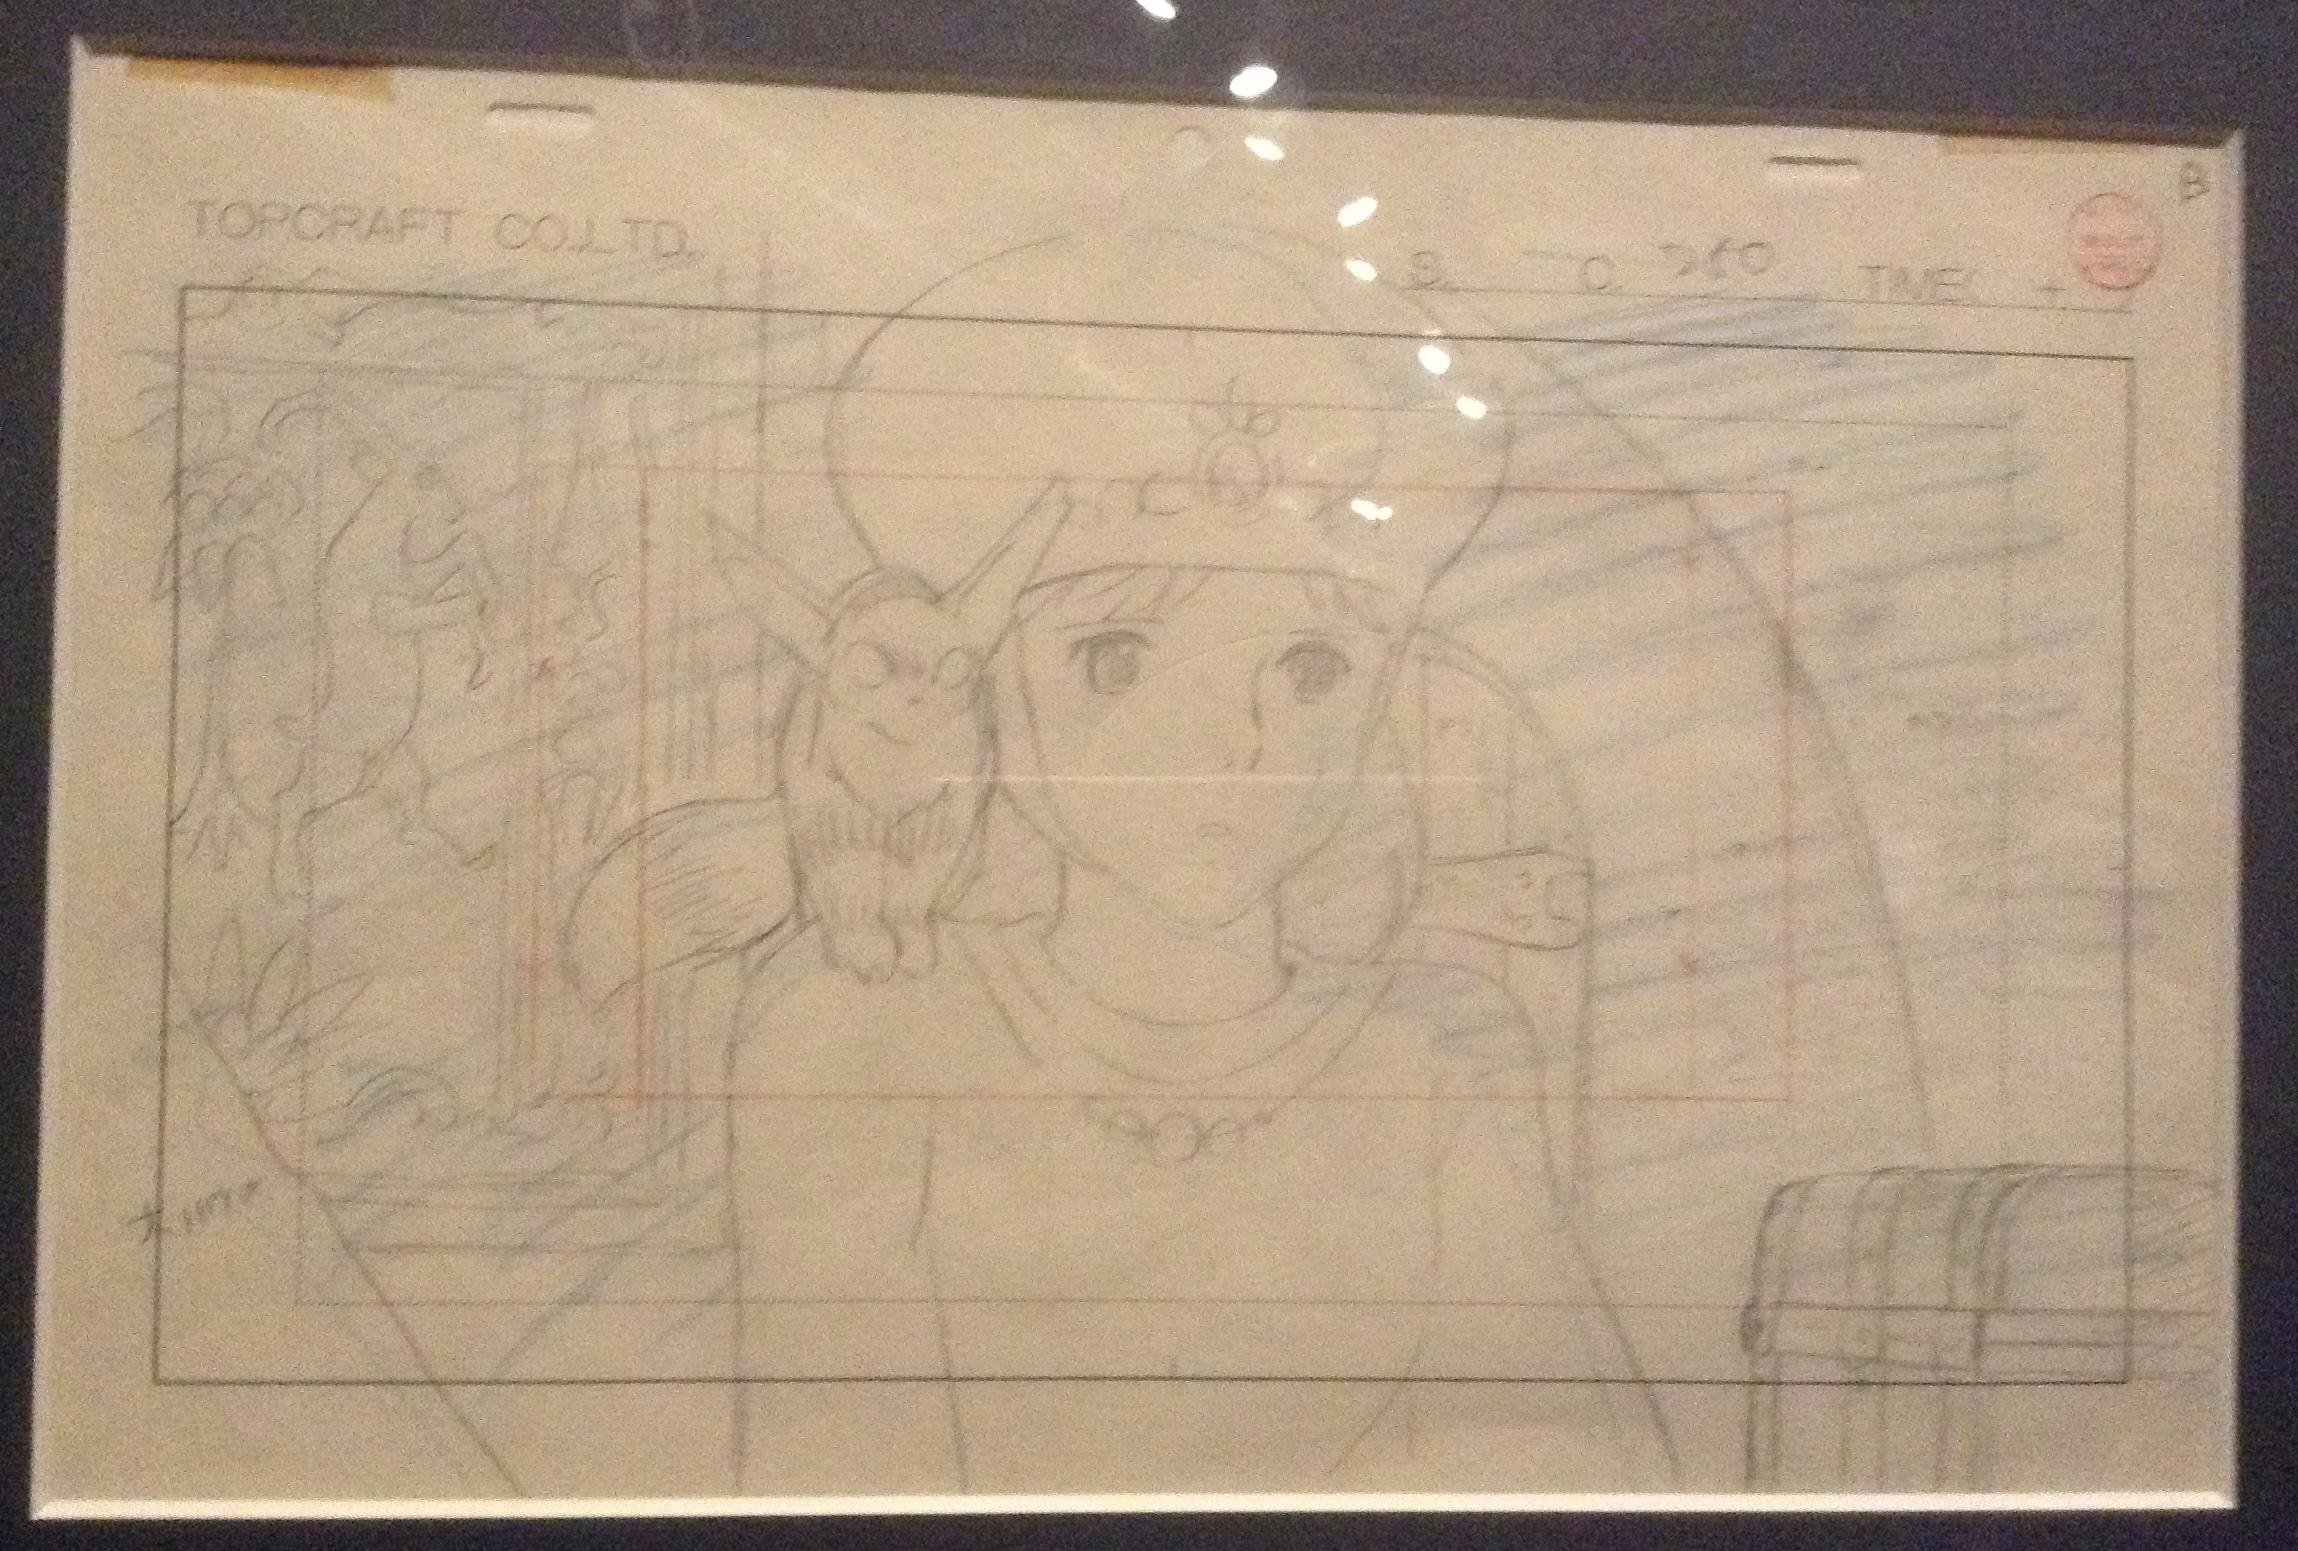 Nausicaä de la vallée du vent, Hayao Miyazaki, 1984